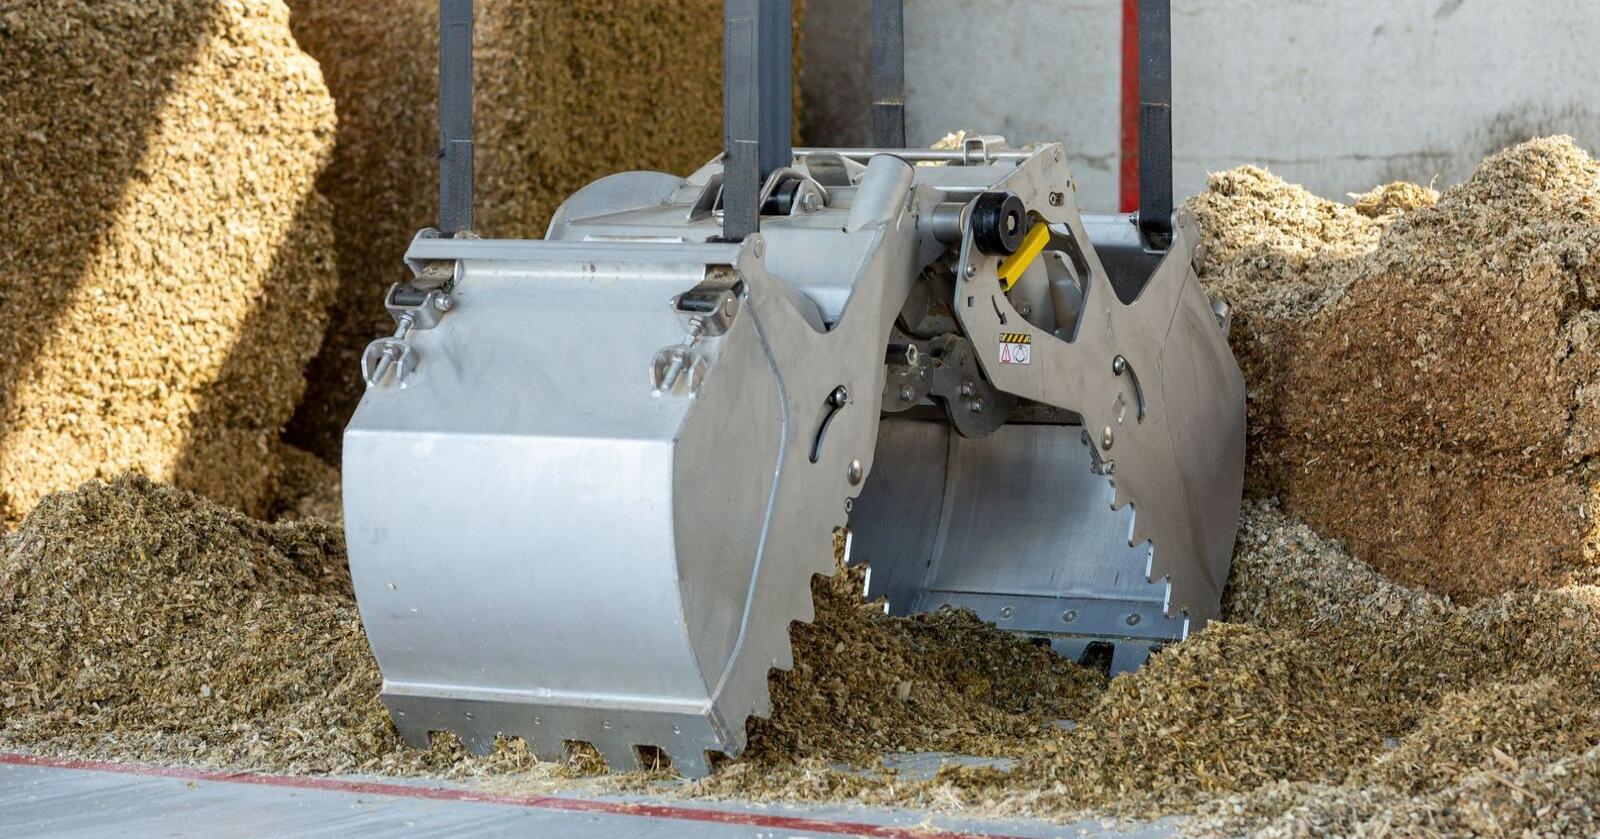 SØL: Den nye fôrgrabben til Lely er utformet slik at den søler mindre. Foto: Ernie Buts